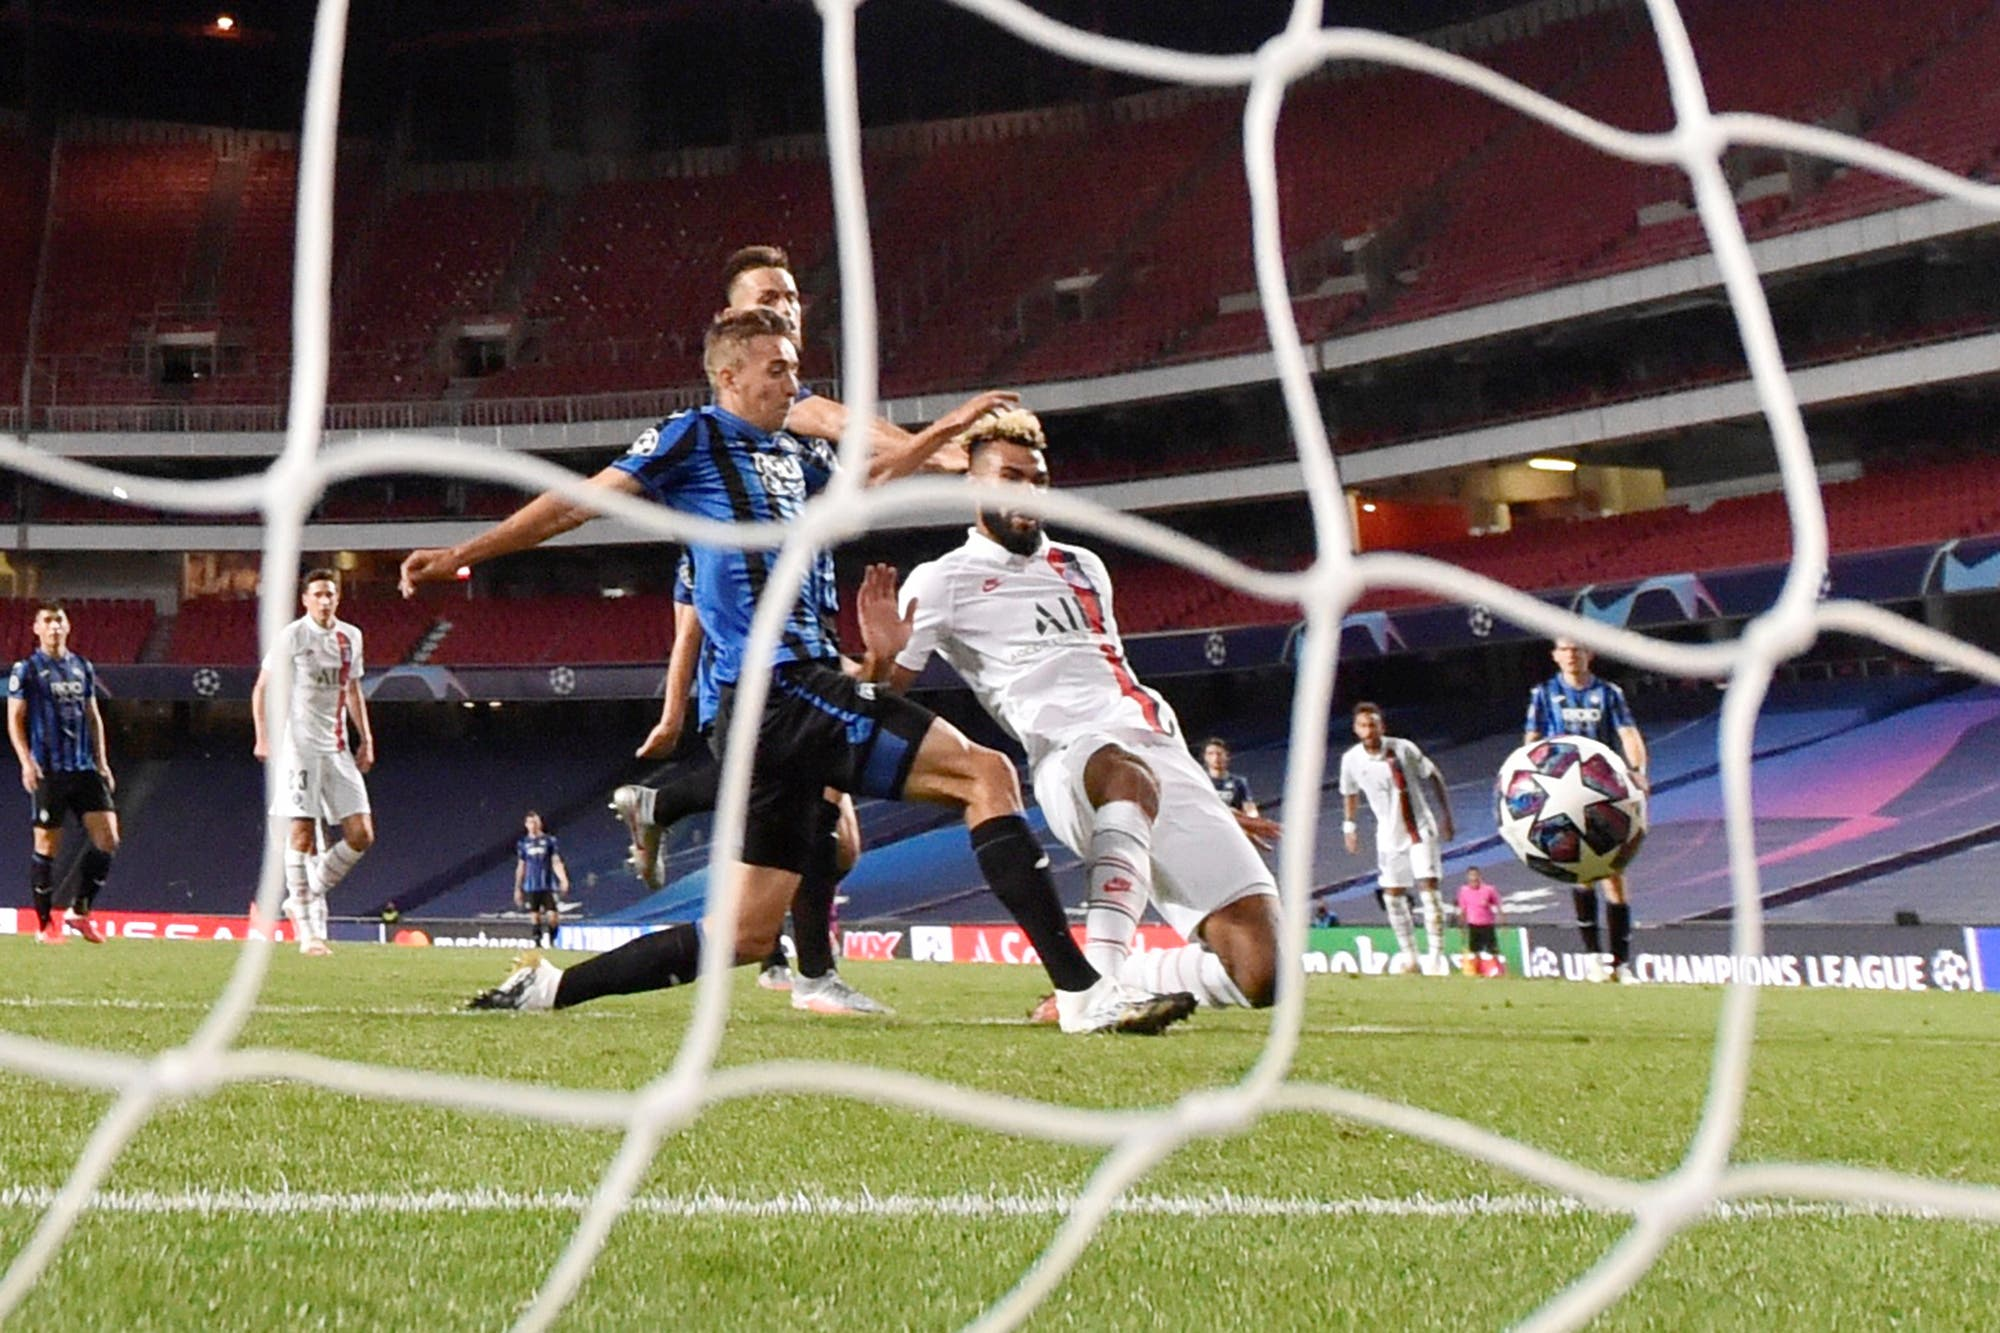 PSG-Atalanta: el video de los dos goles agónicos en tres minutos que les dio a los franceses el pasaje a semis de la Champions League